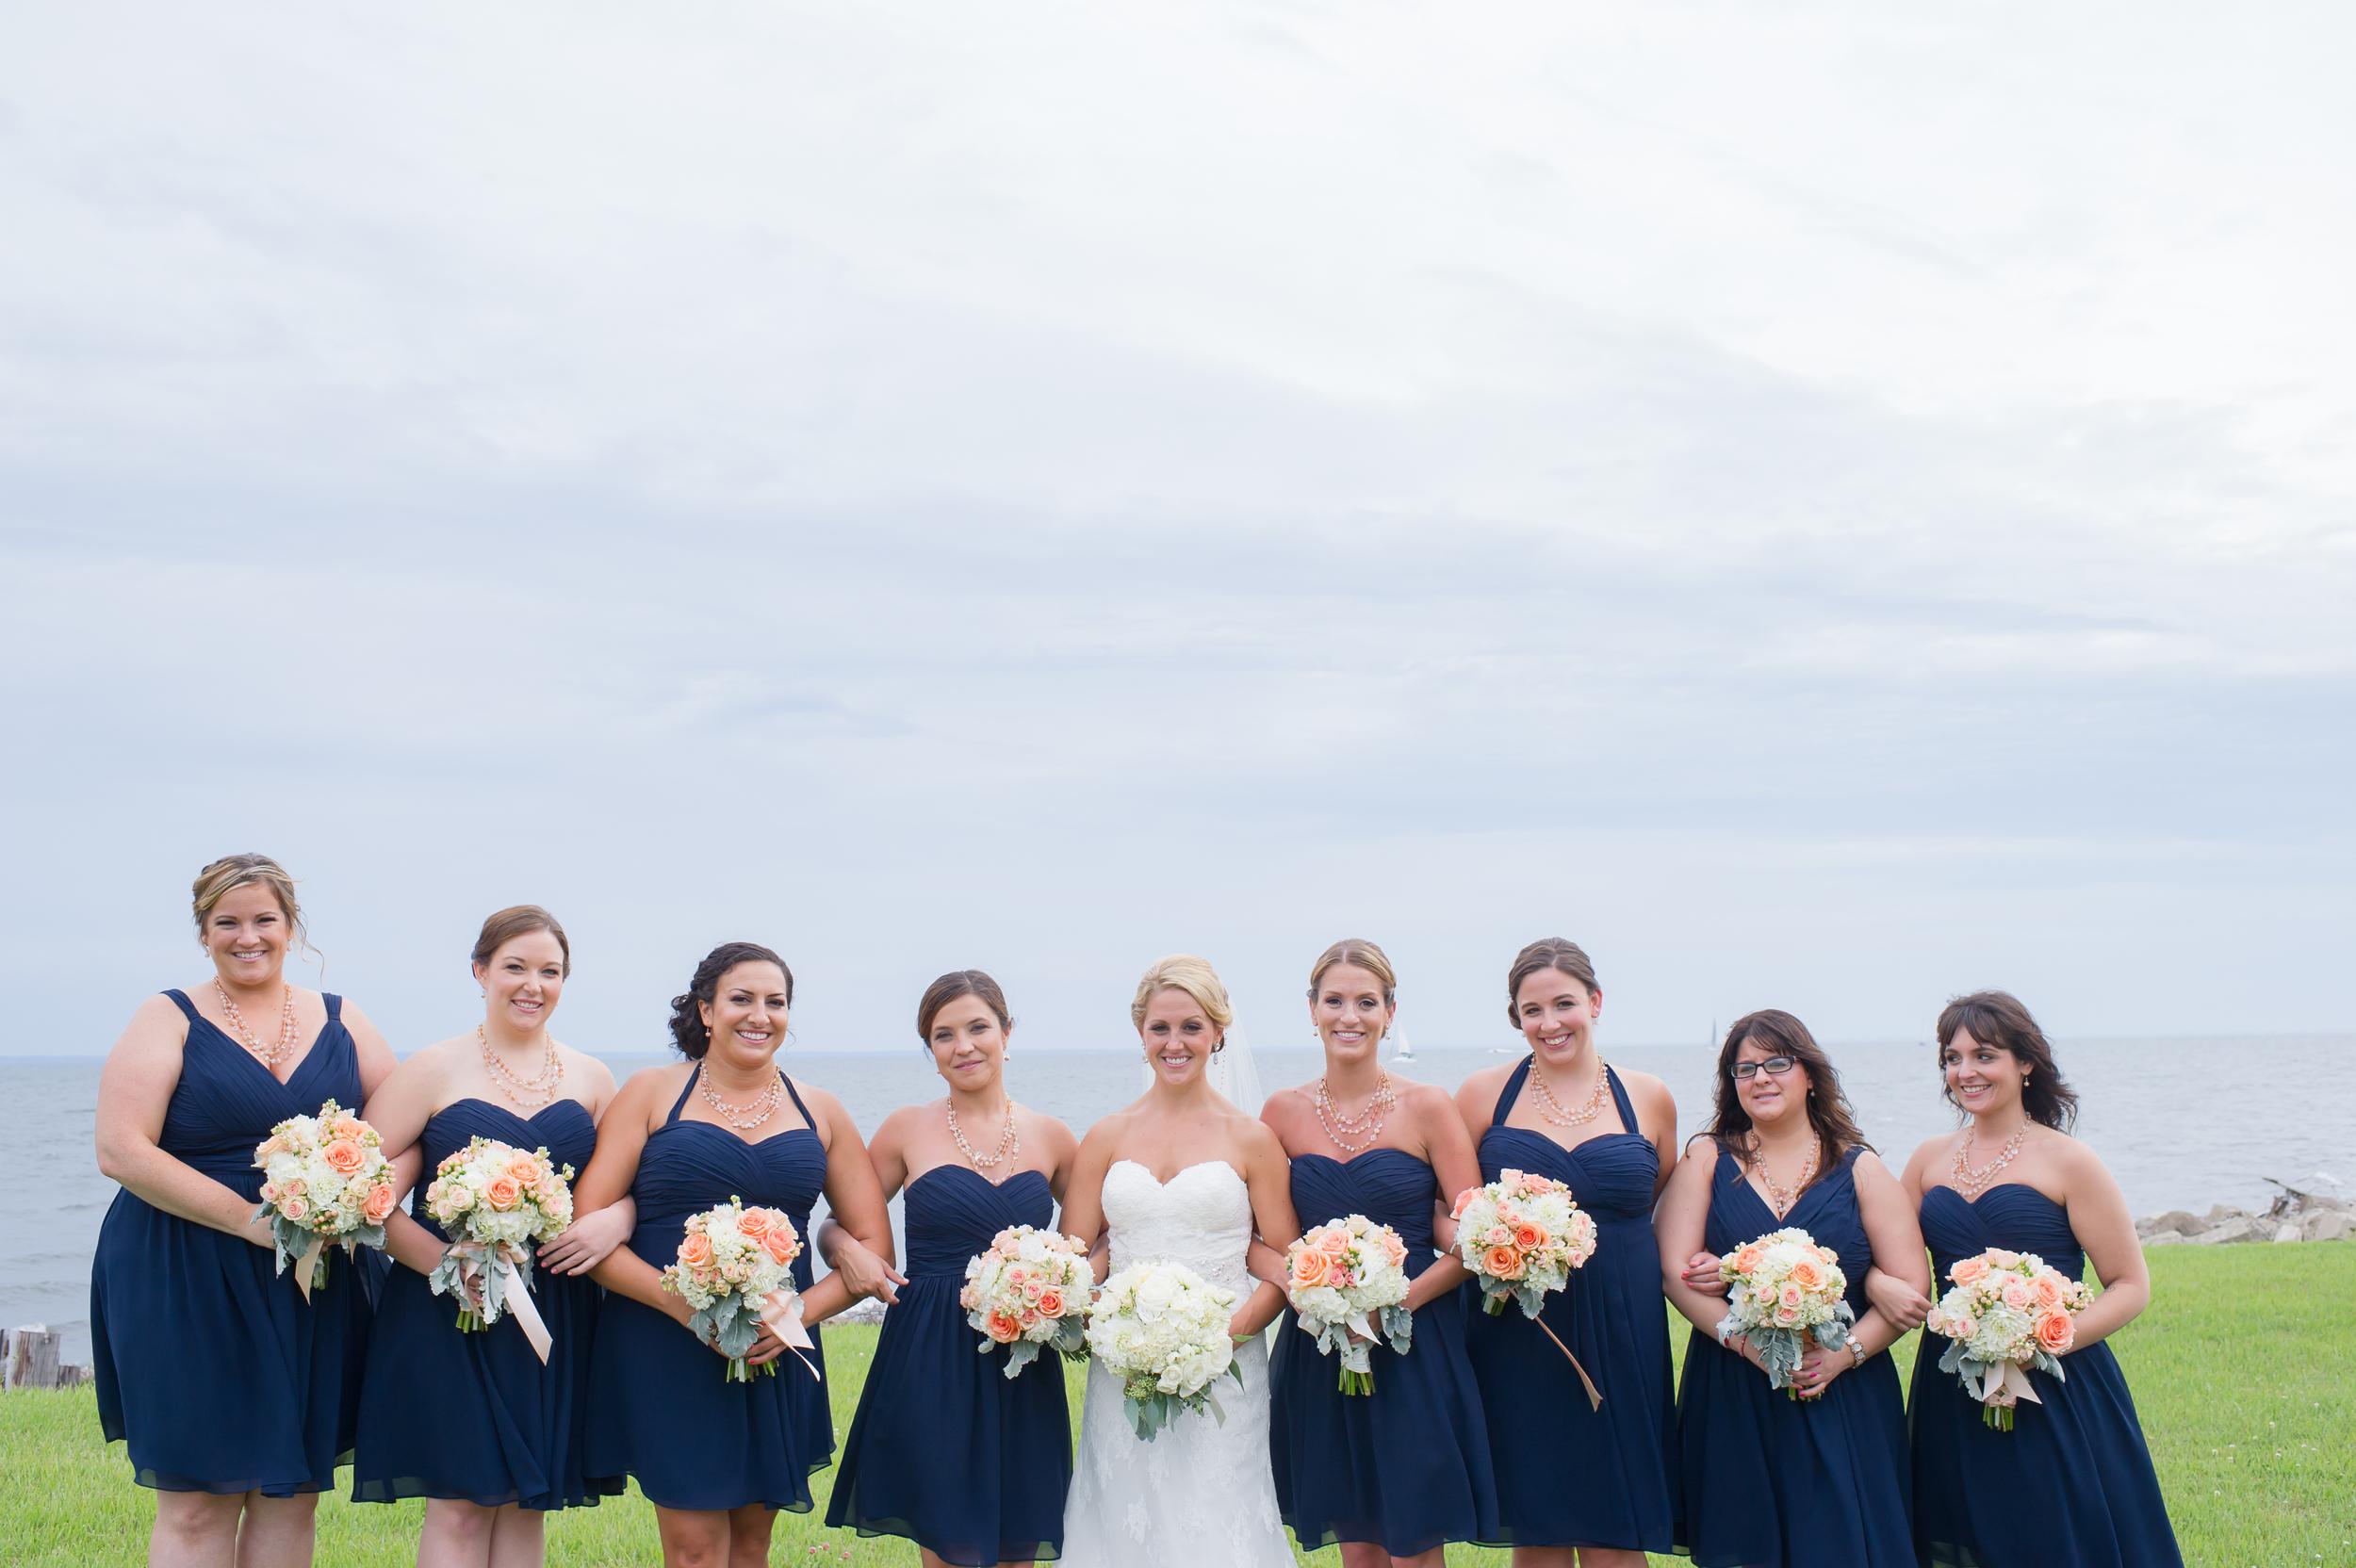 CT Beach Tented Wedding